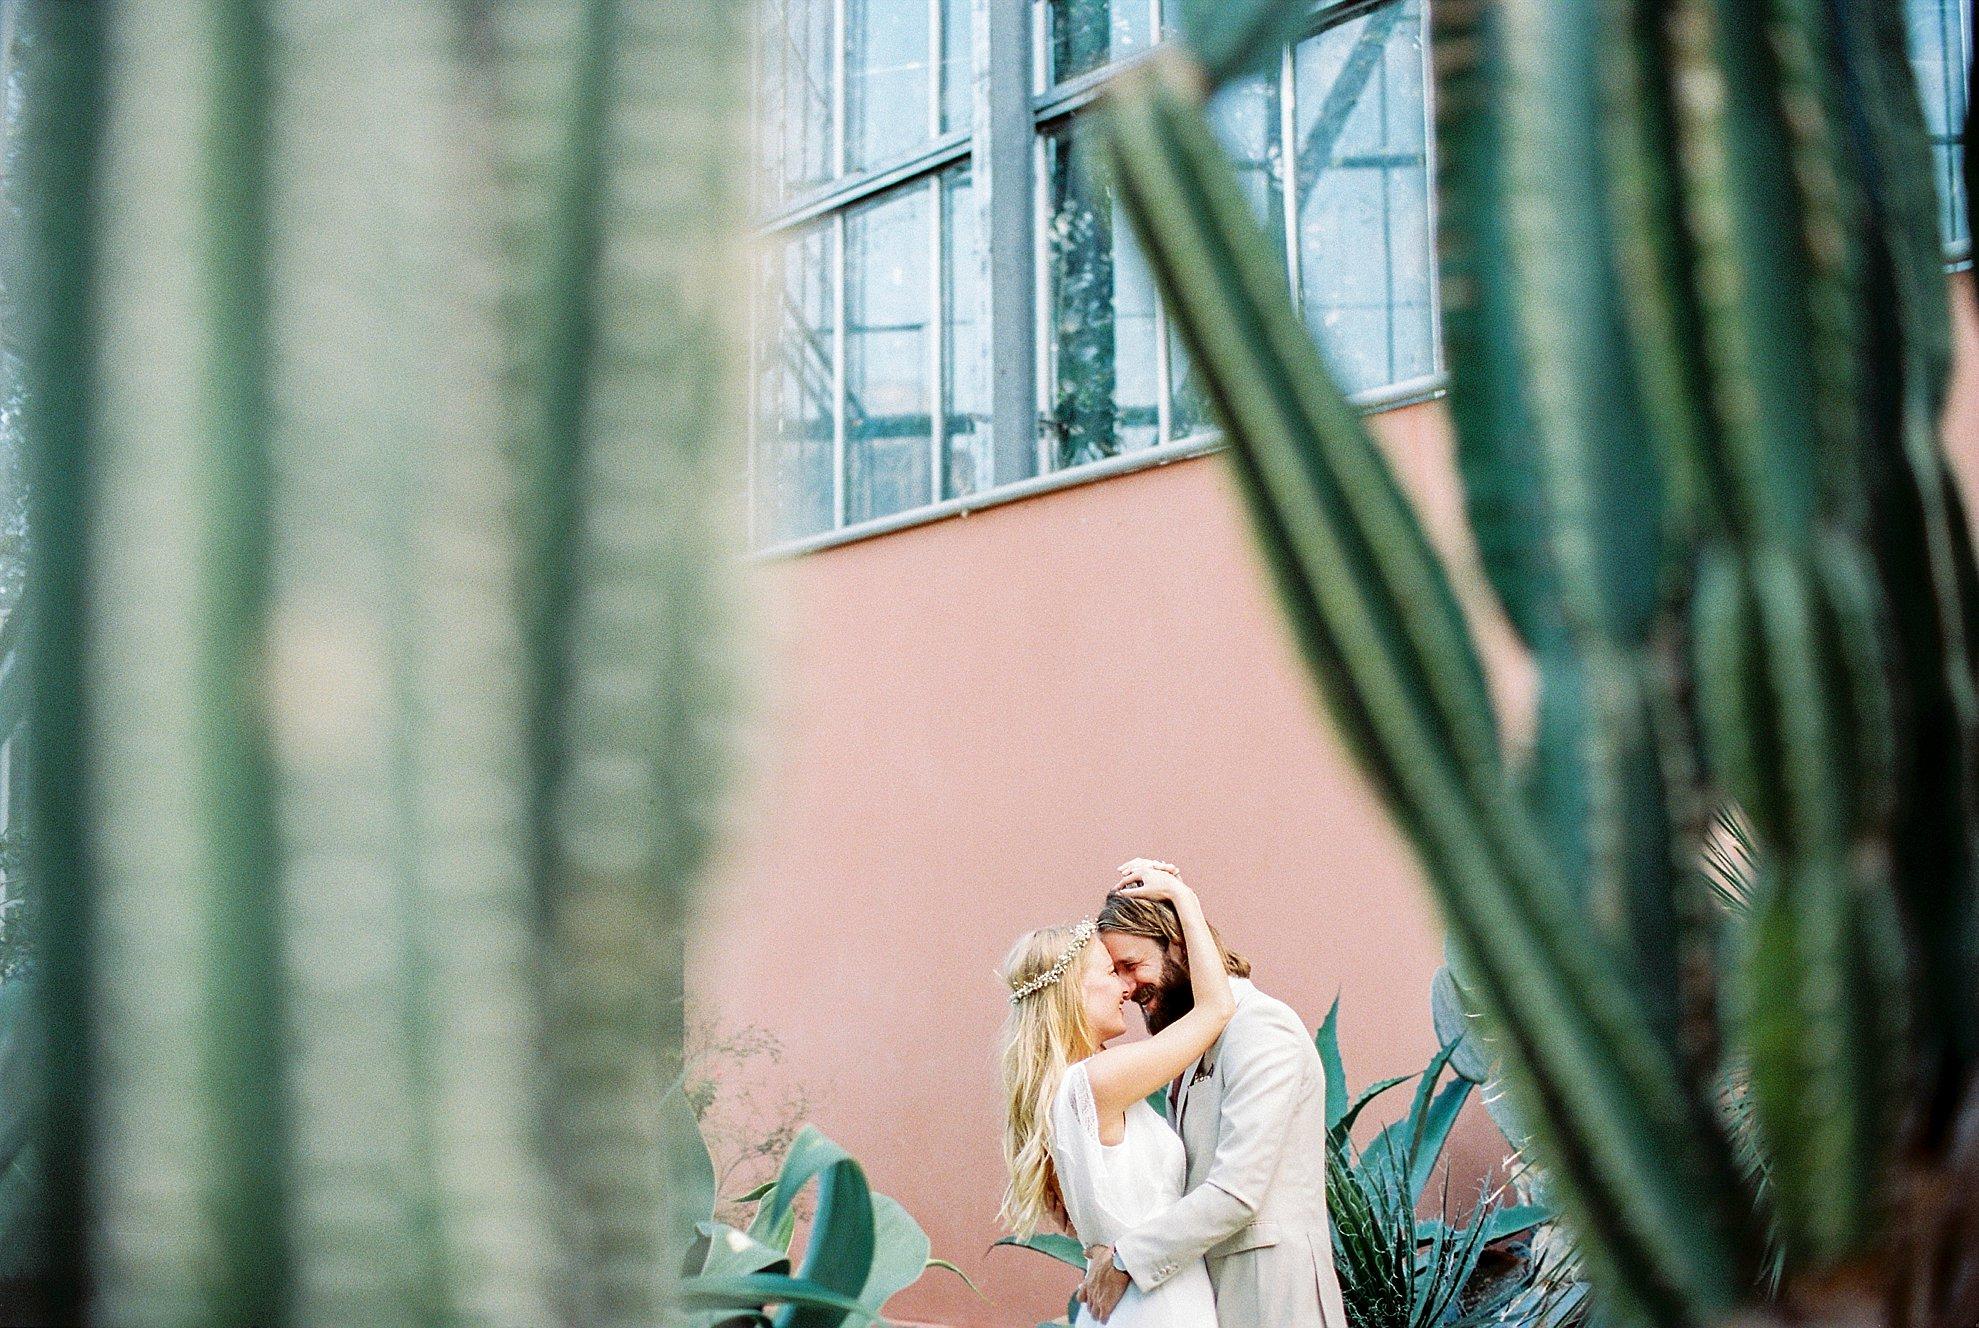 Amanda-Drost-photography-Hortus-Amsterdam-wedding_0006.jpg